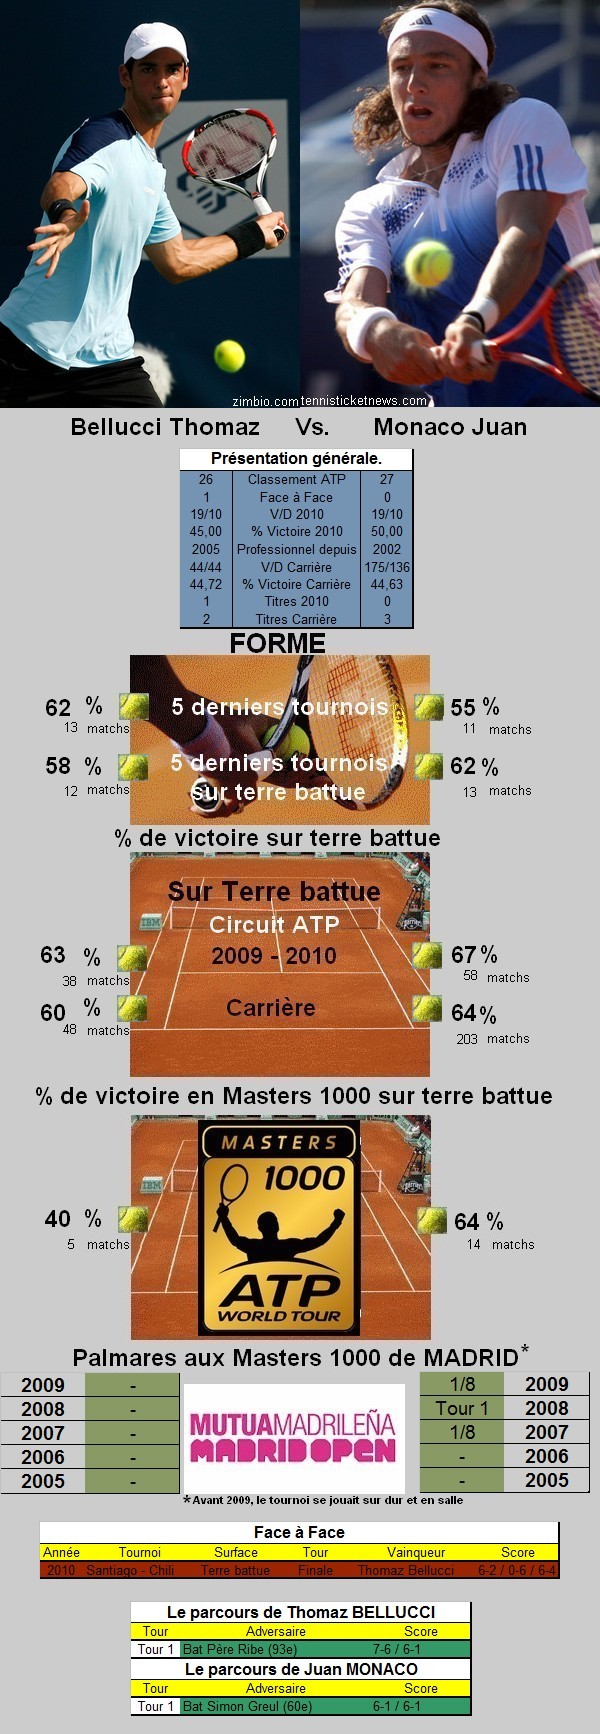 Statistiques tennis de Bellucci contre Monaco à Madrid